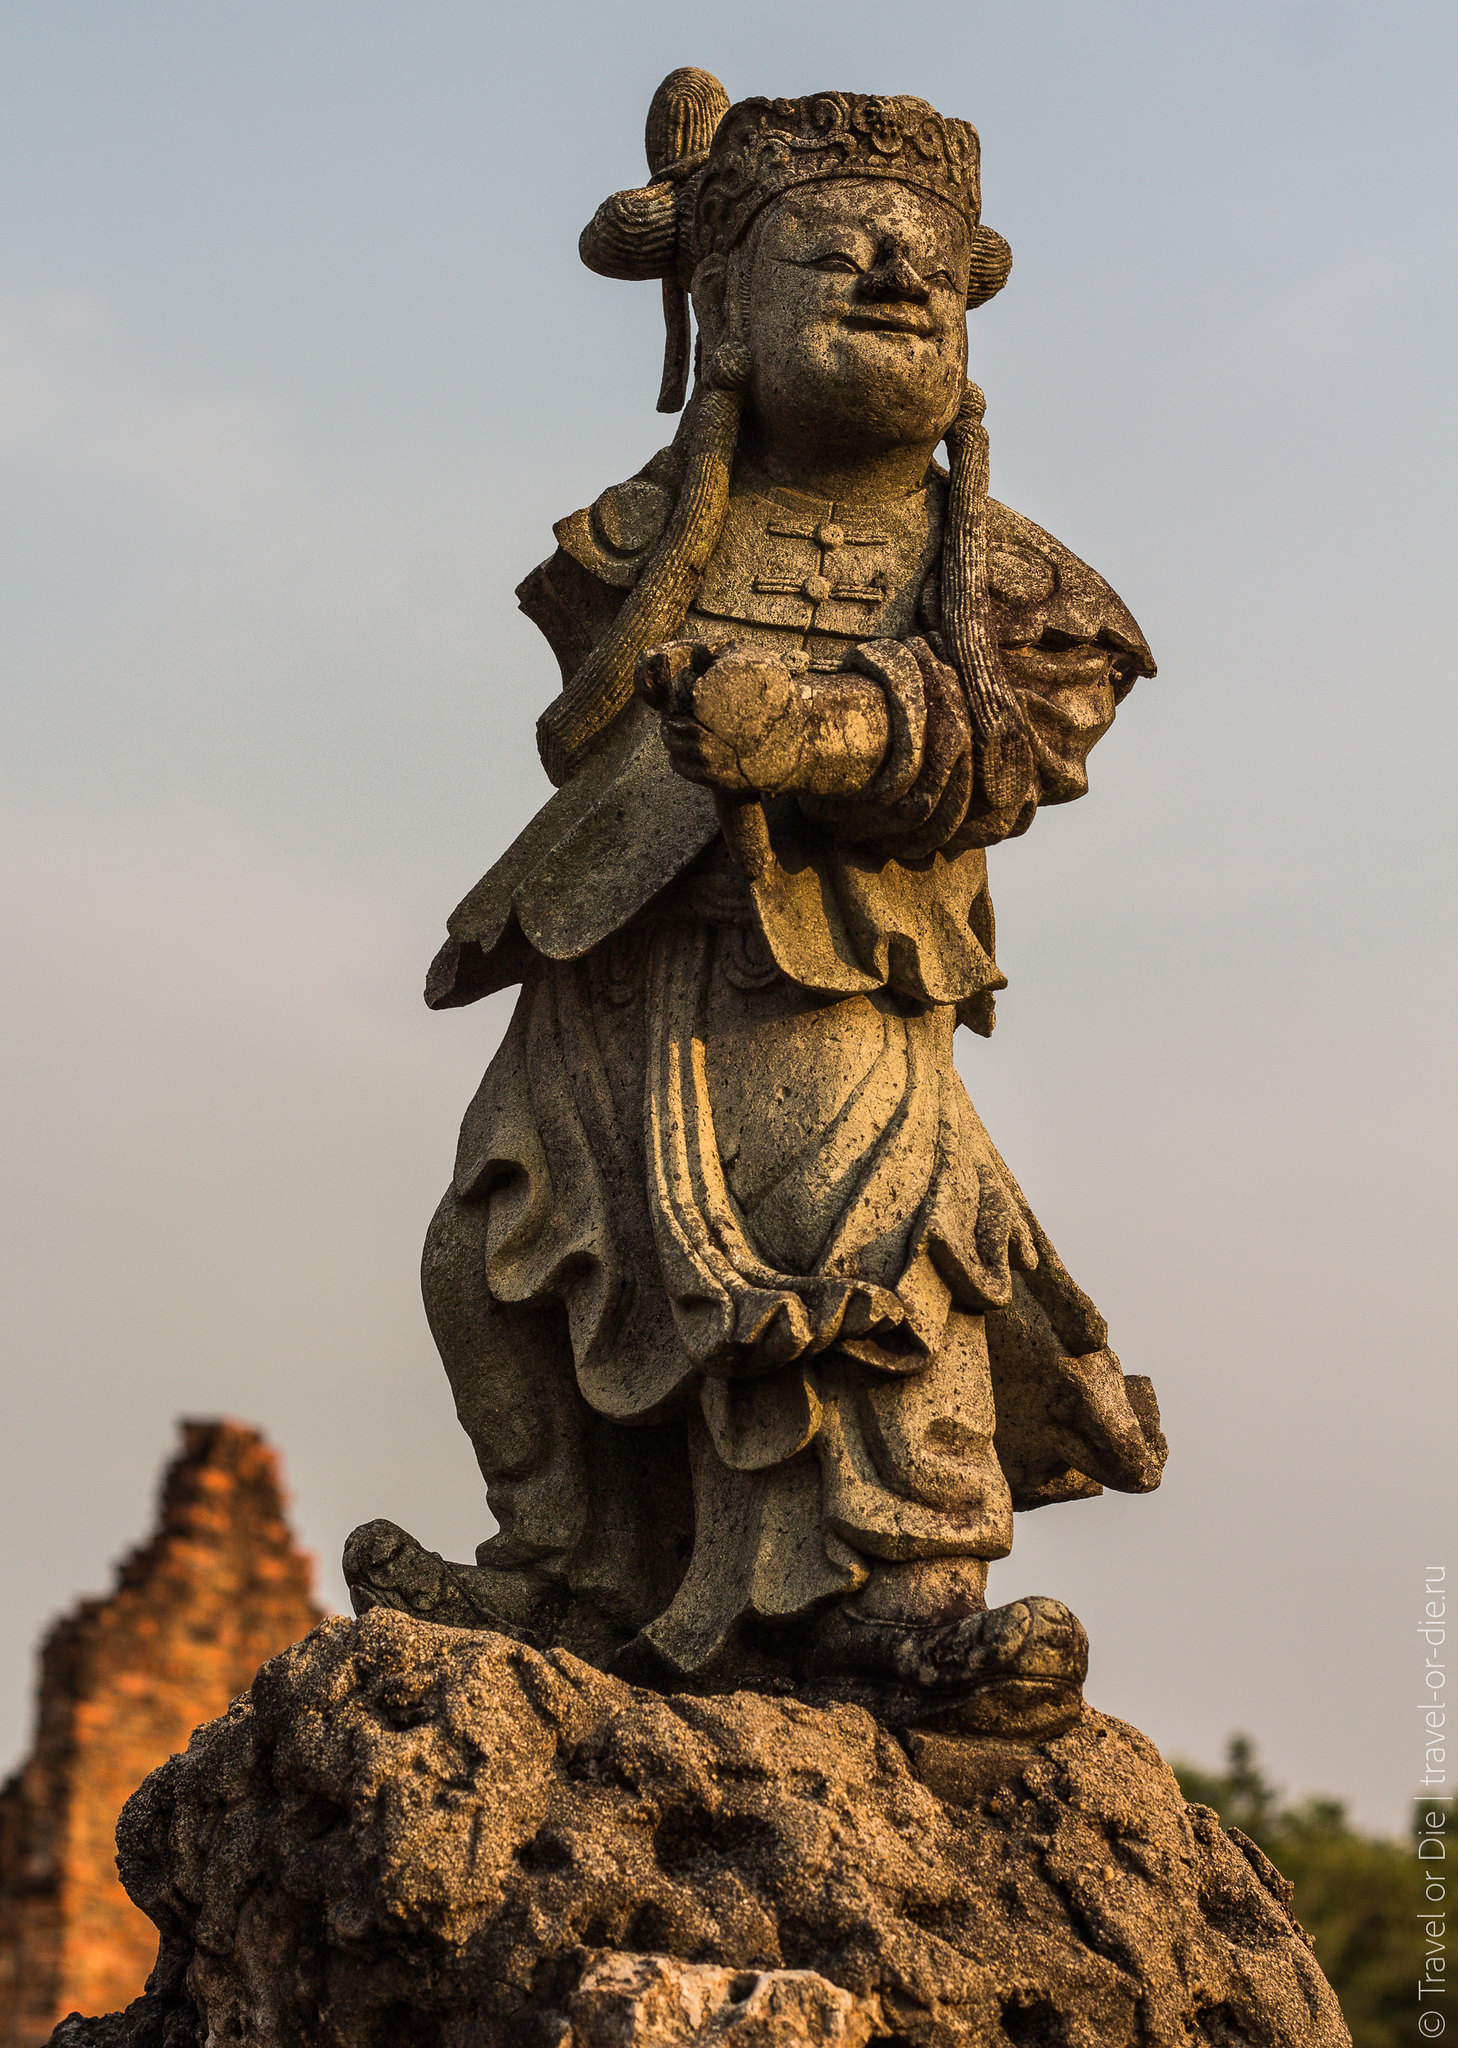 Ancient-City-Muang-Boran-Bangkok-1067